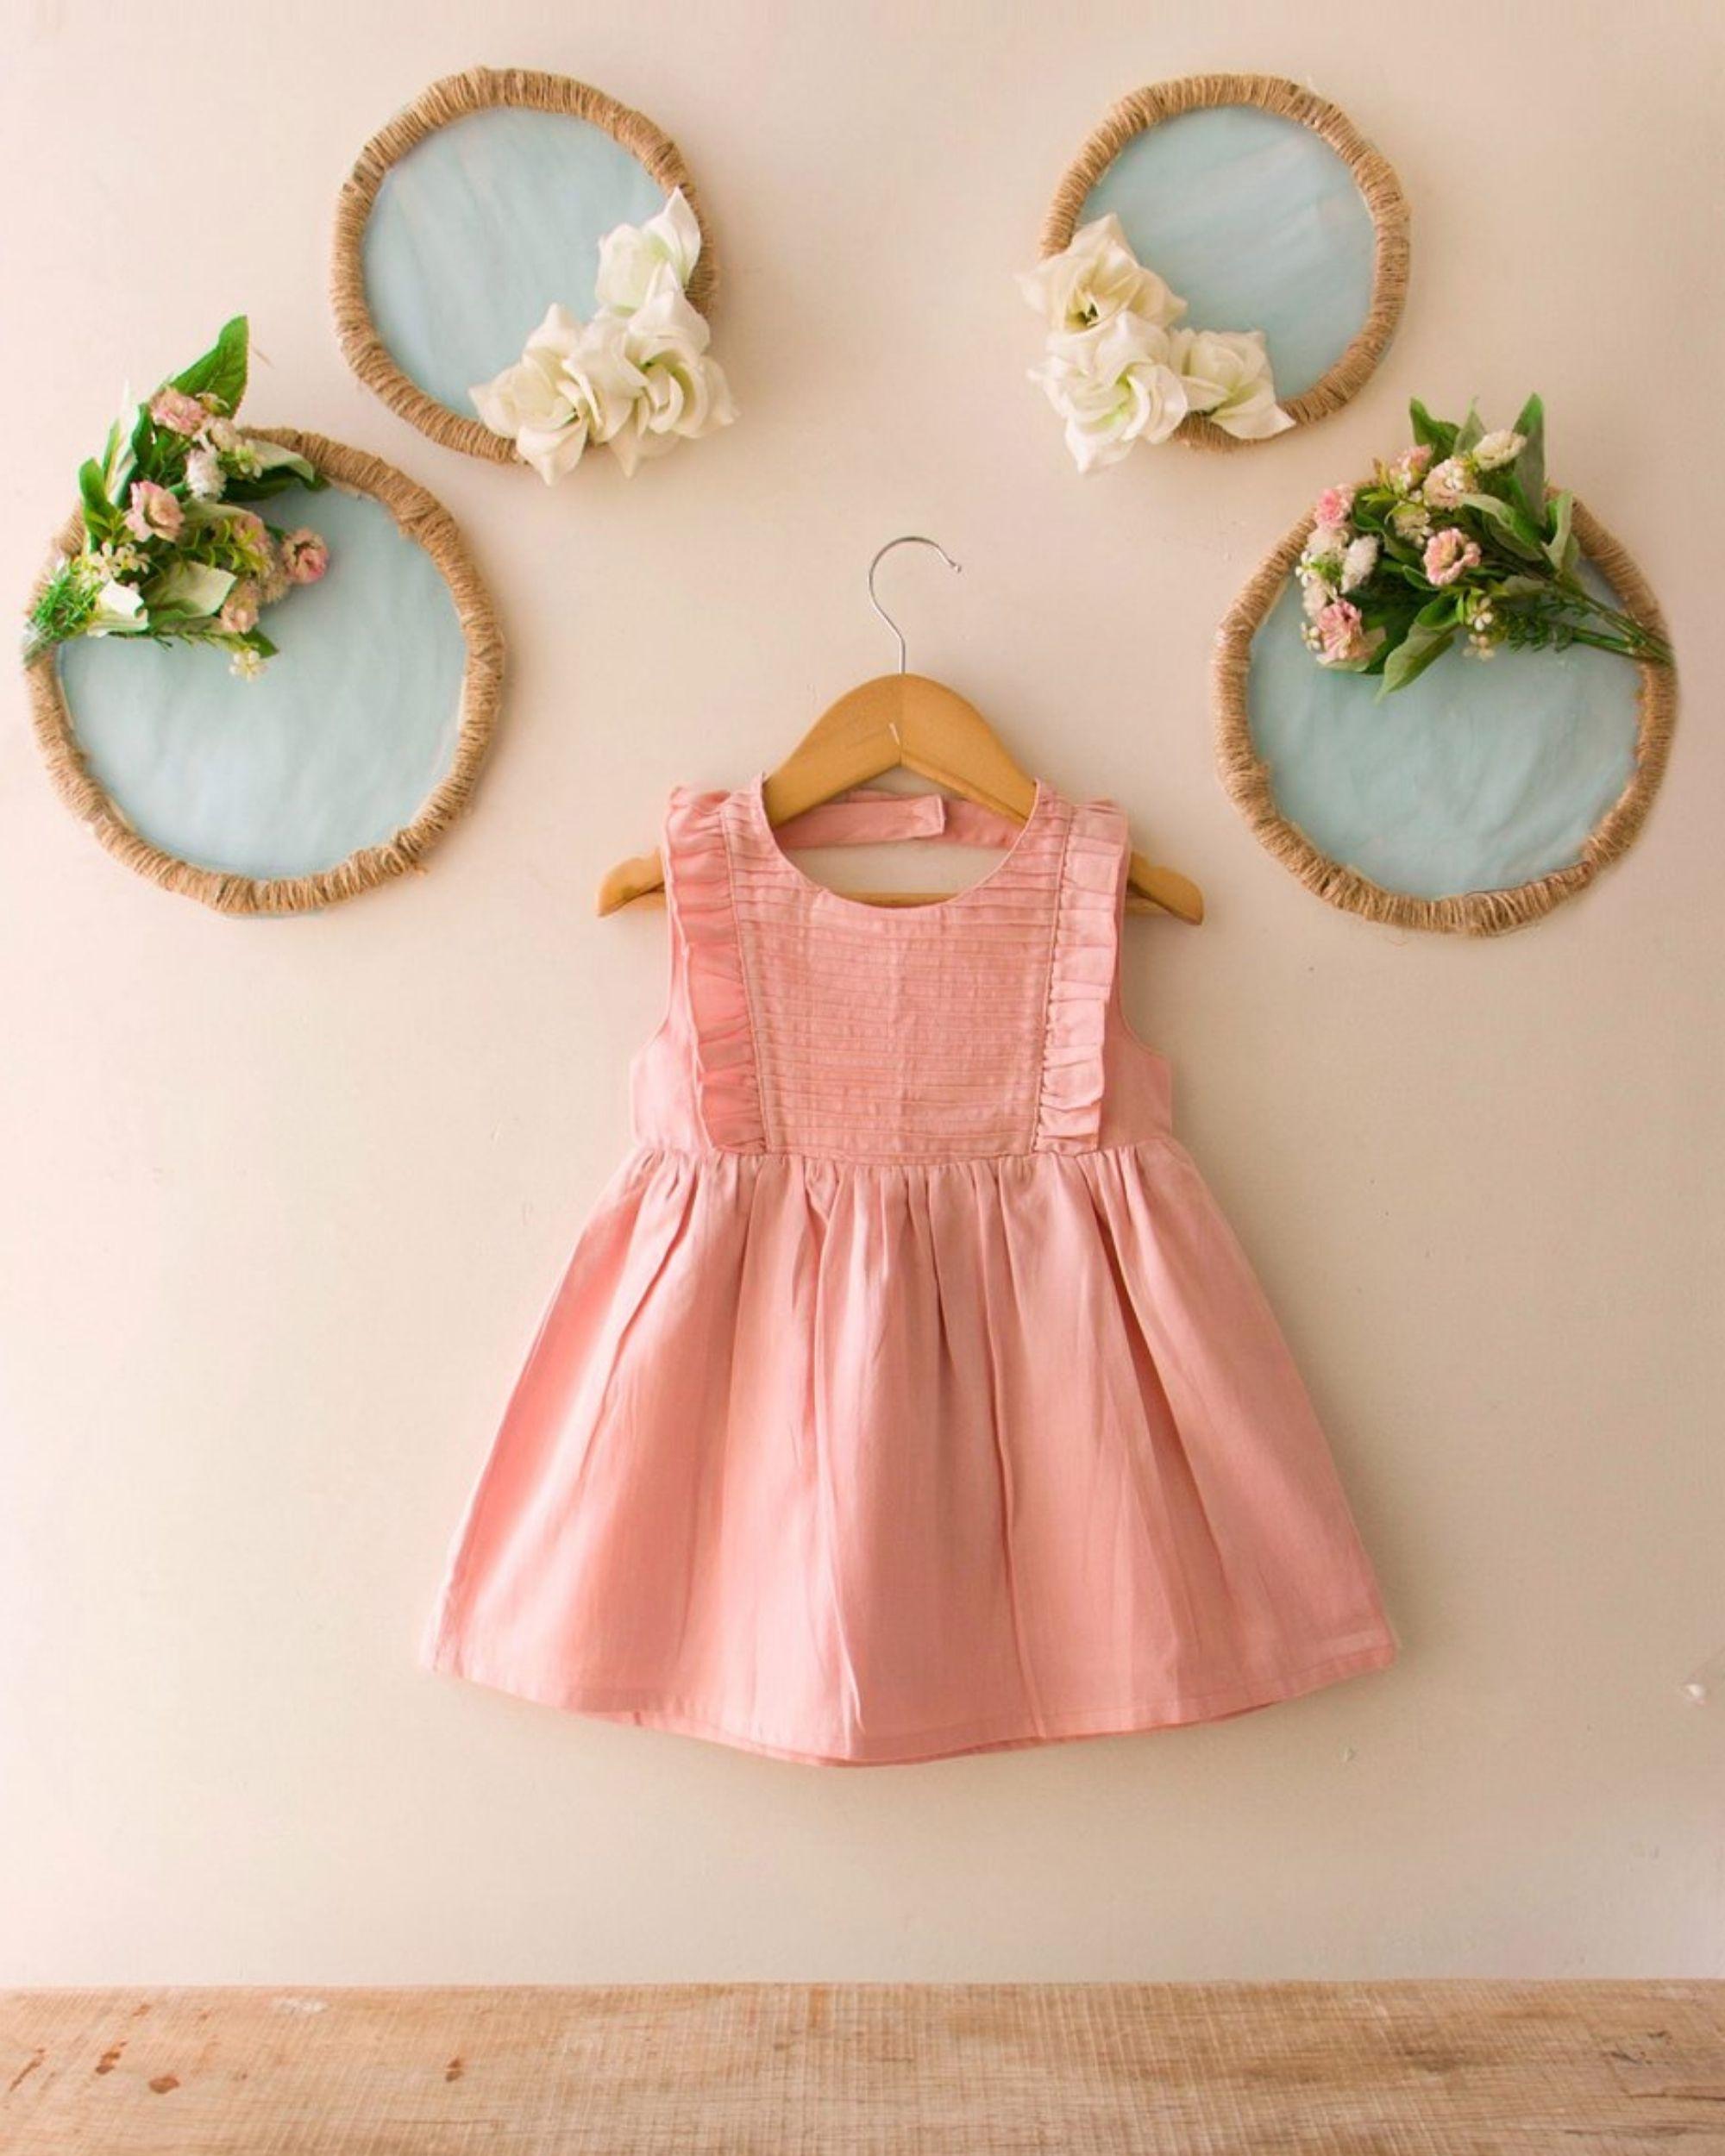 Pink pin-tuck dress